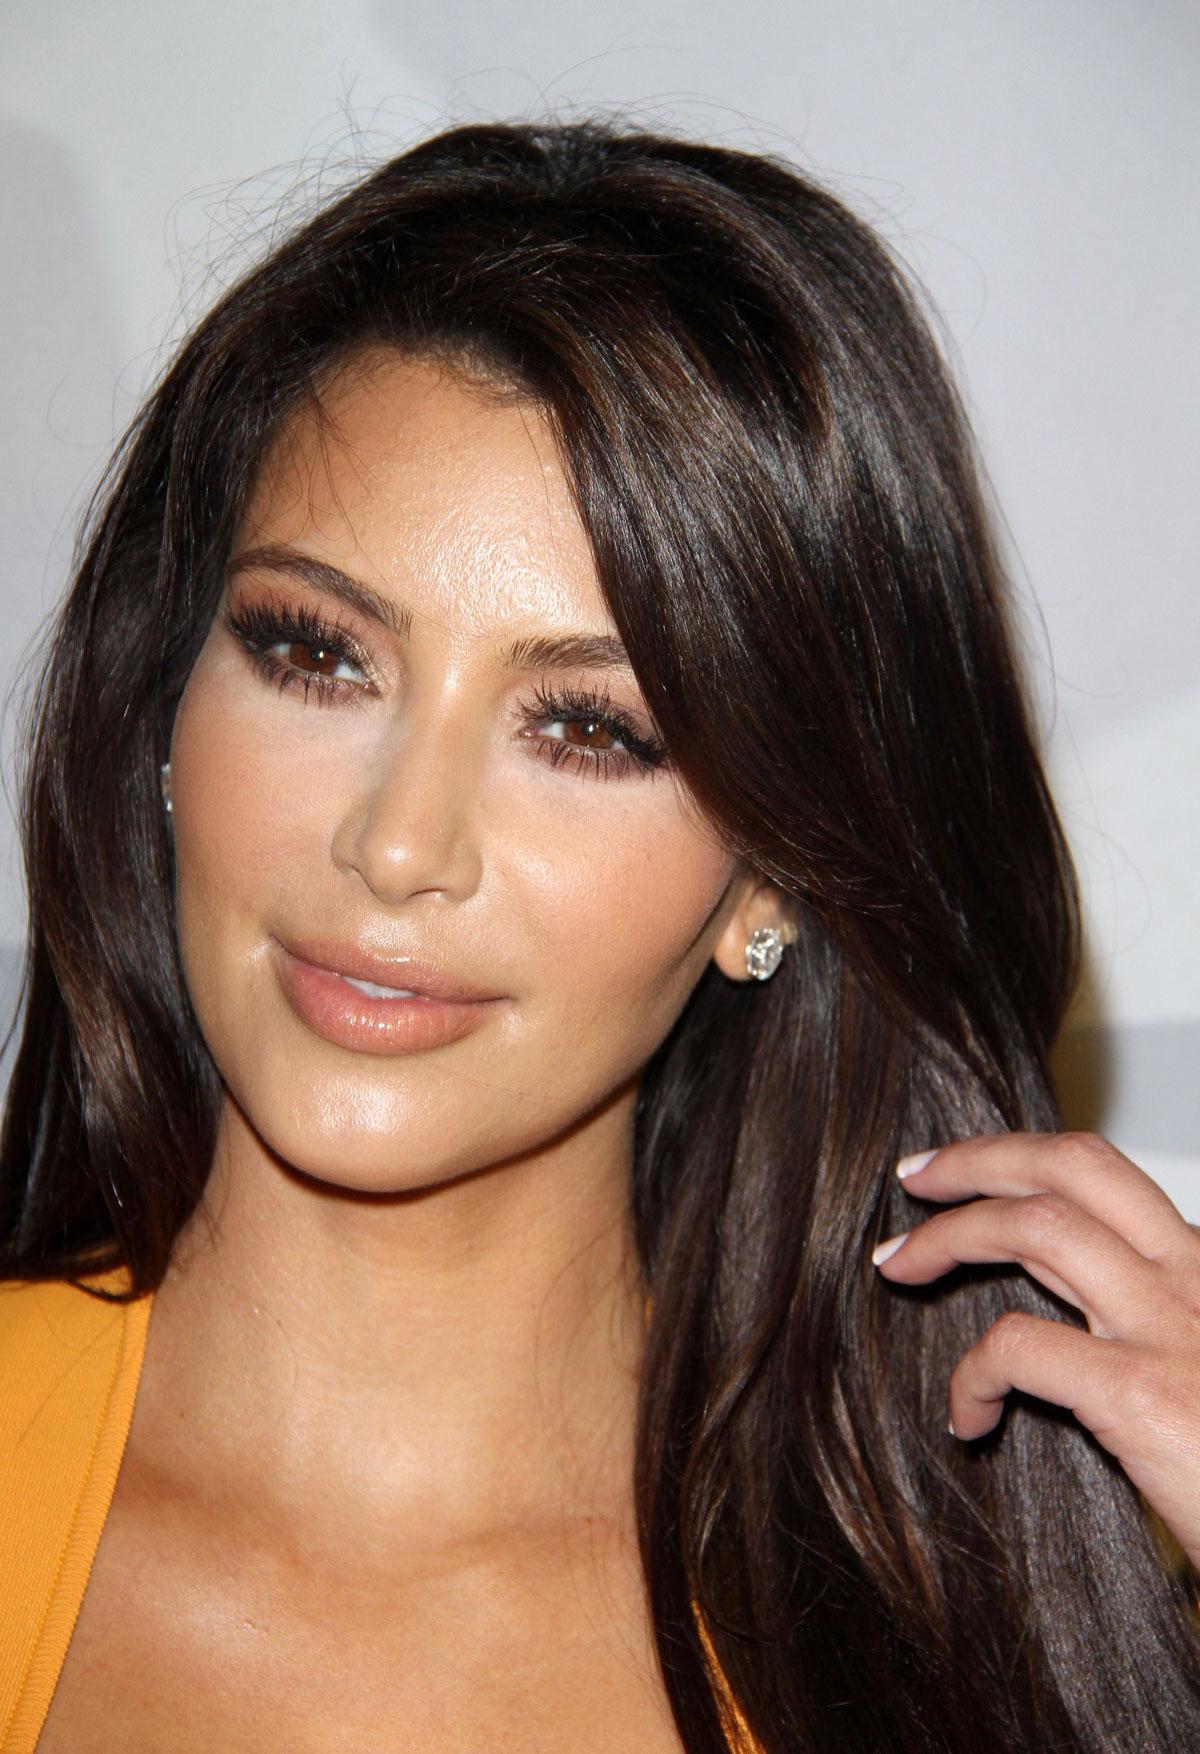 Kim Kardashian Interviews Kylie Jenner About Her Best: KIM KARDASHIAN At Jeep And USA Basketball Present Power